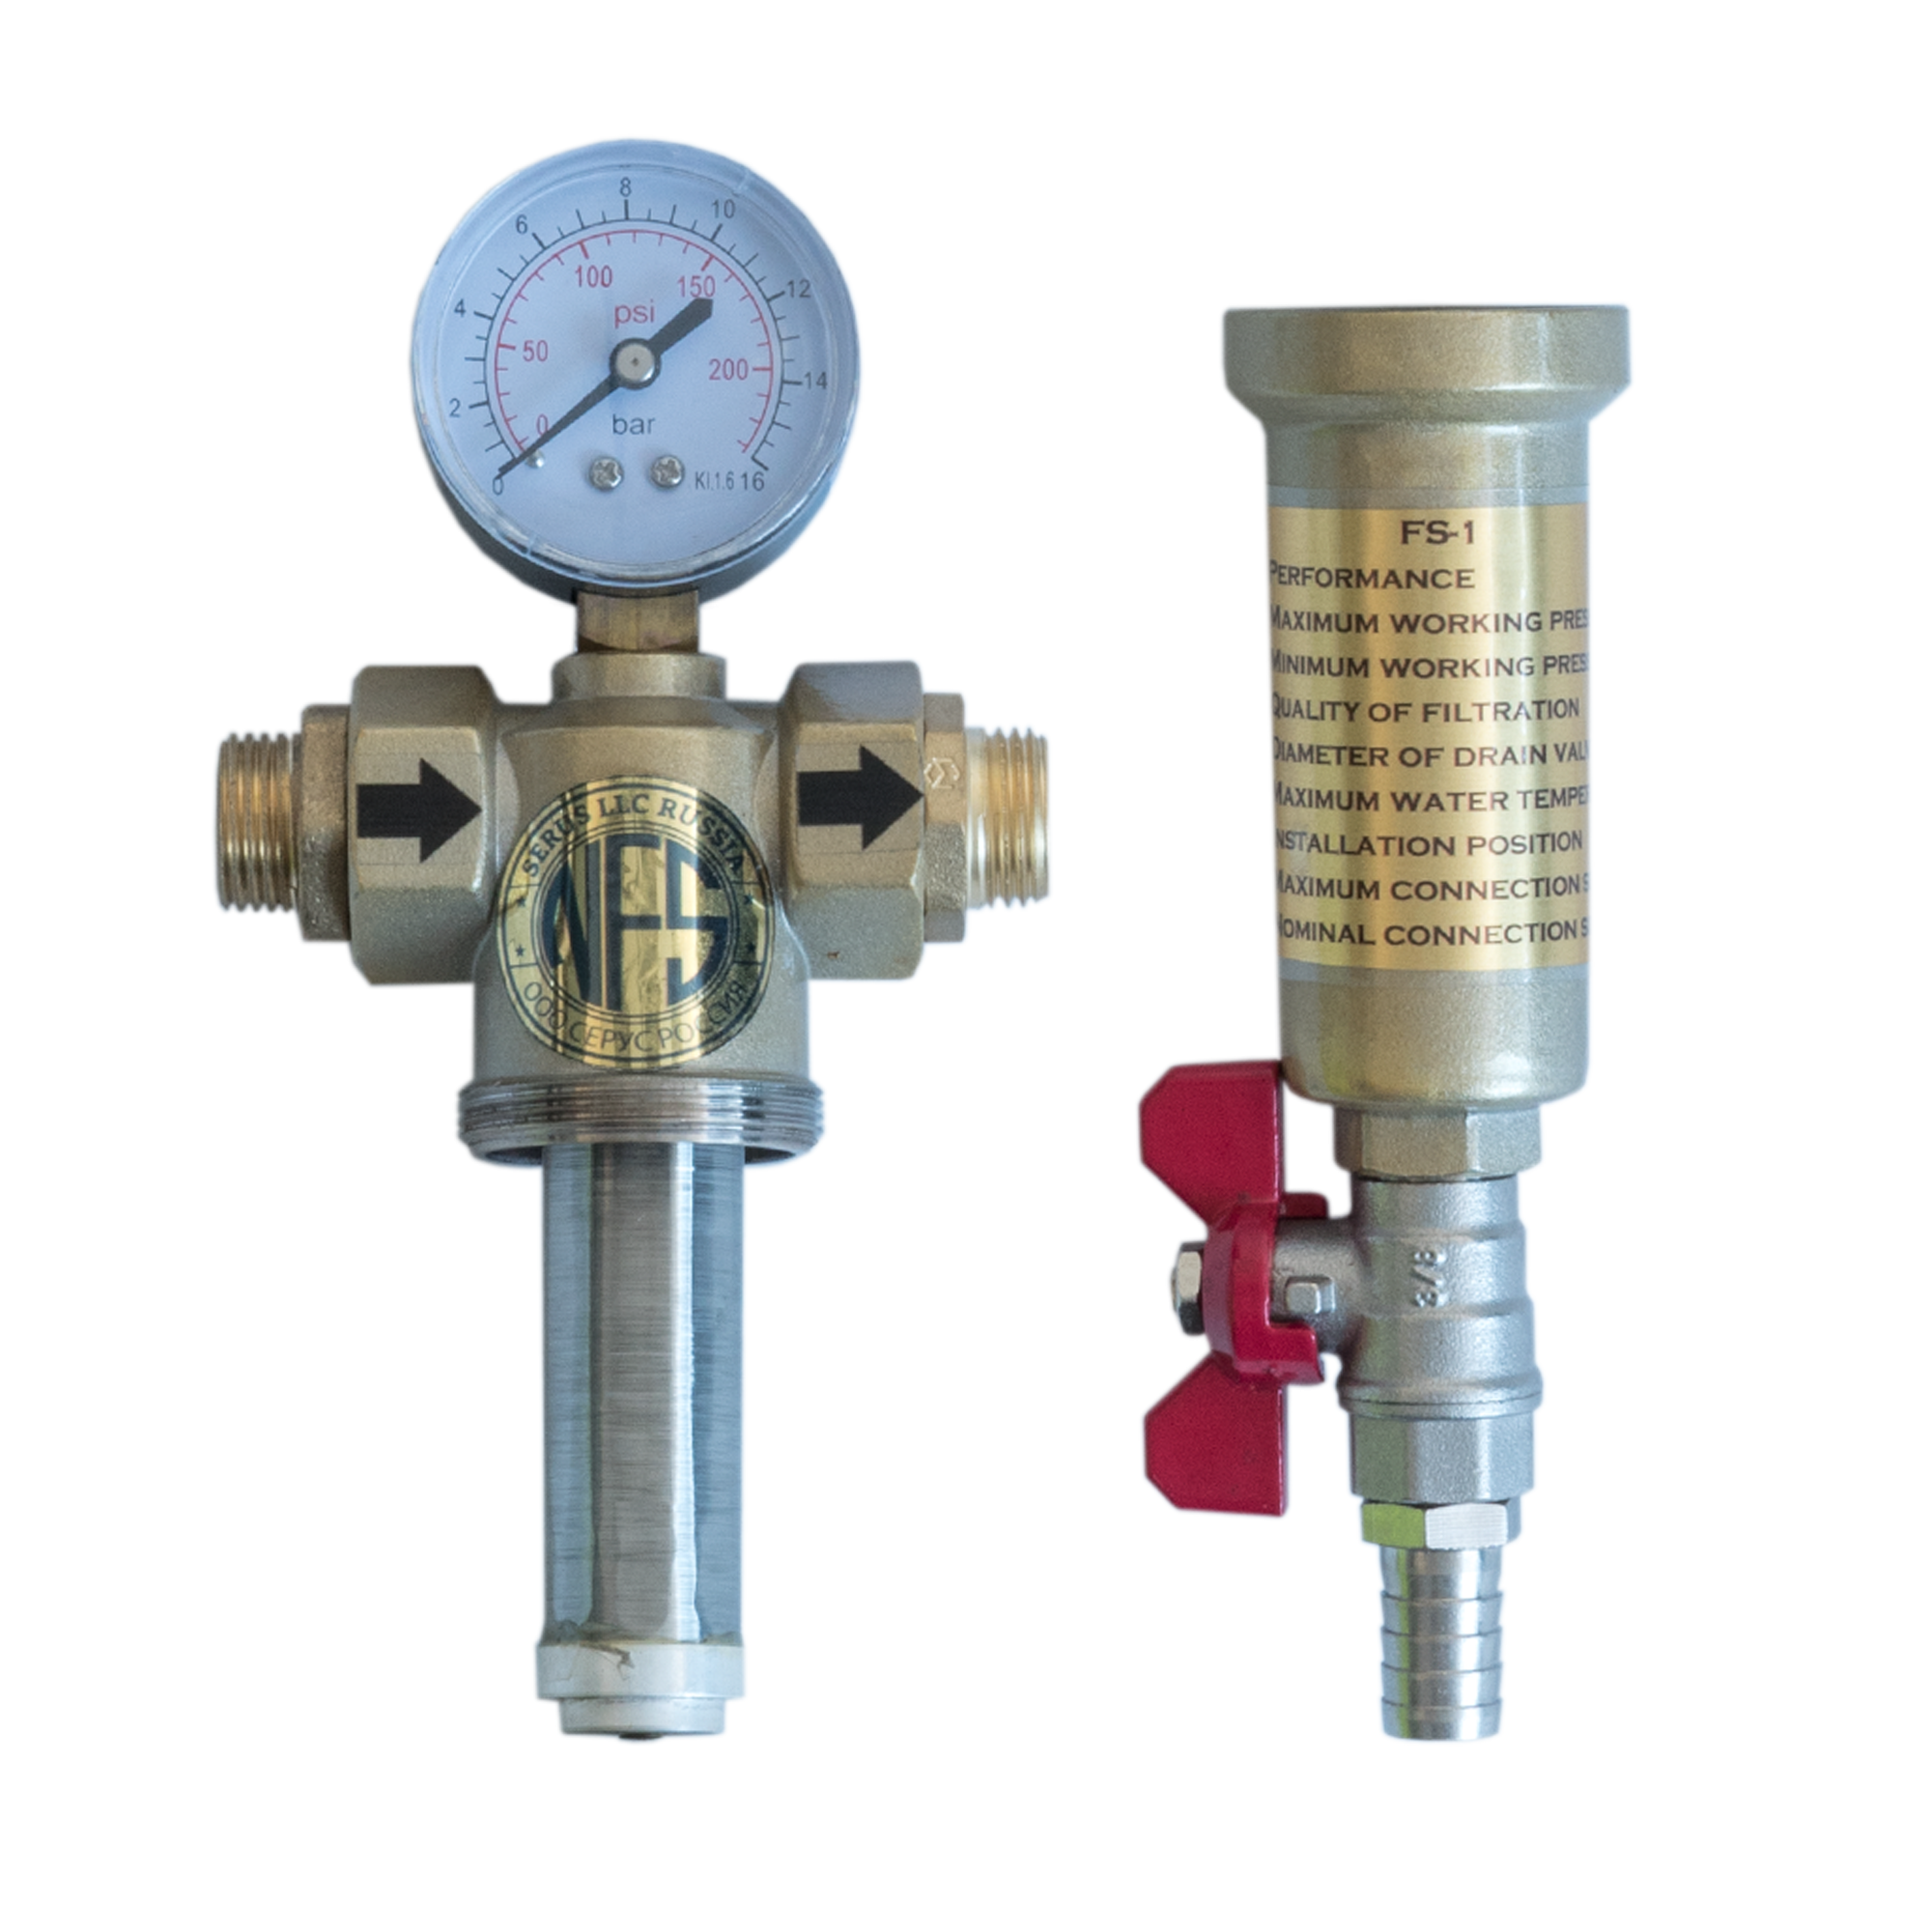 Nano Water Filter Fs-1